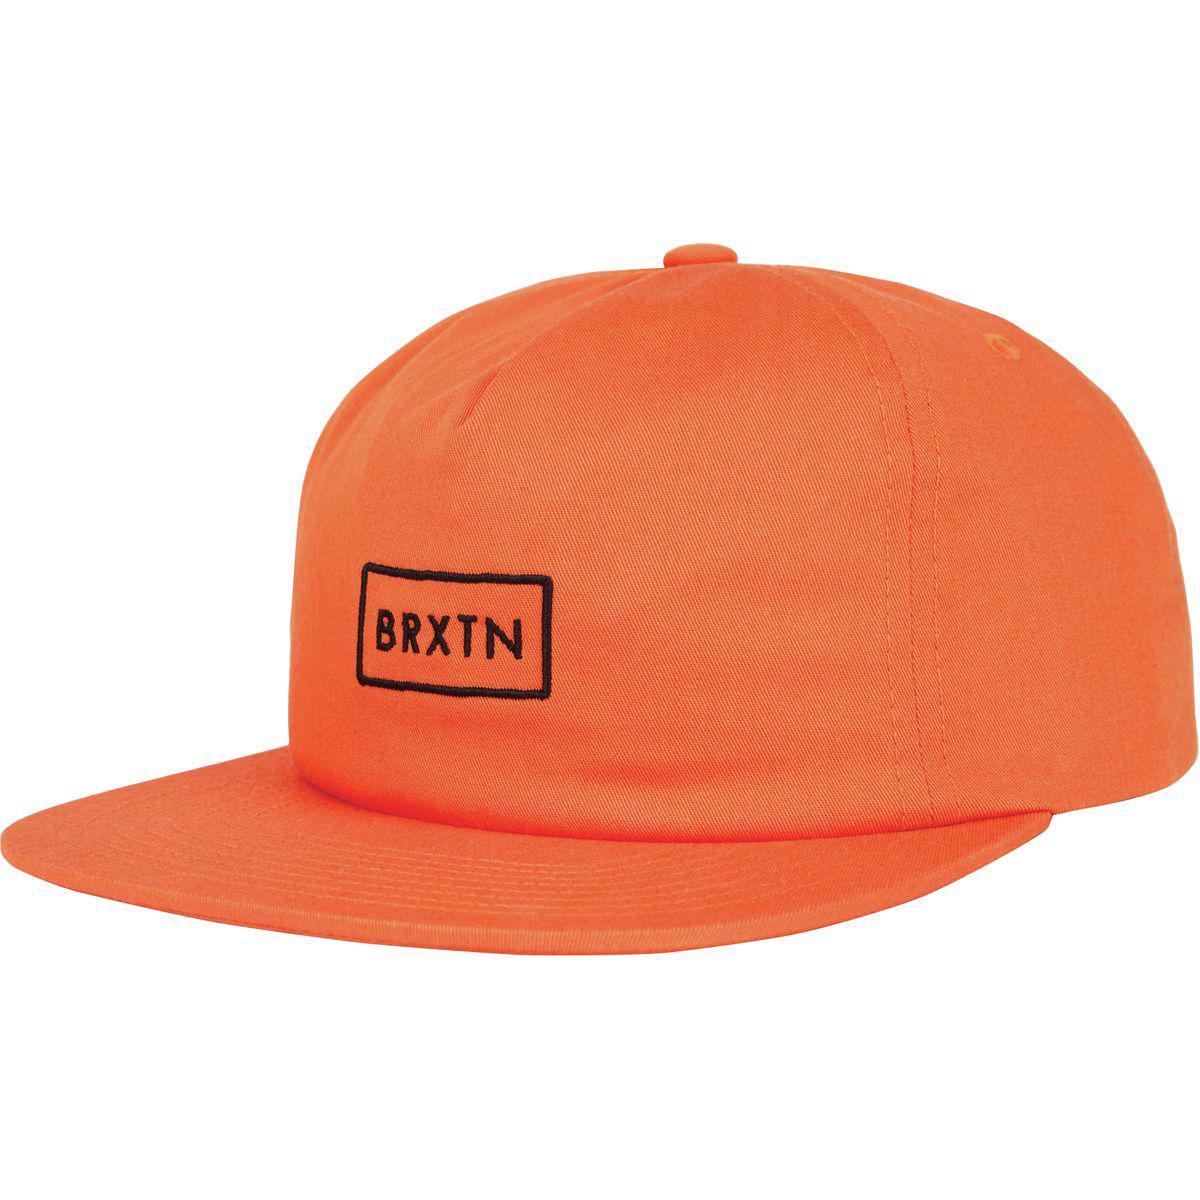 3b81724aebf Lyst - Brixton Rift Mp Snapback Hat in Orange for Men